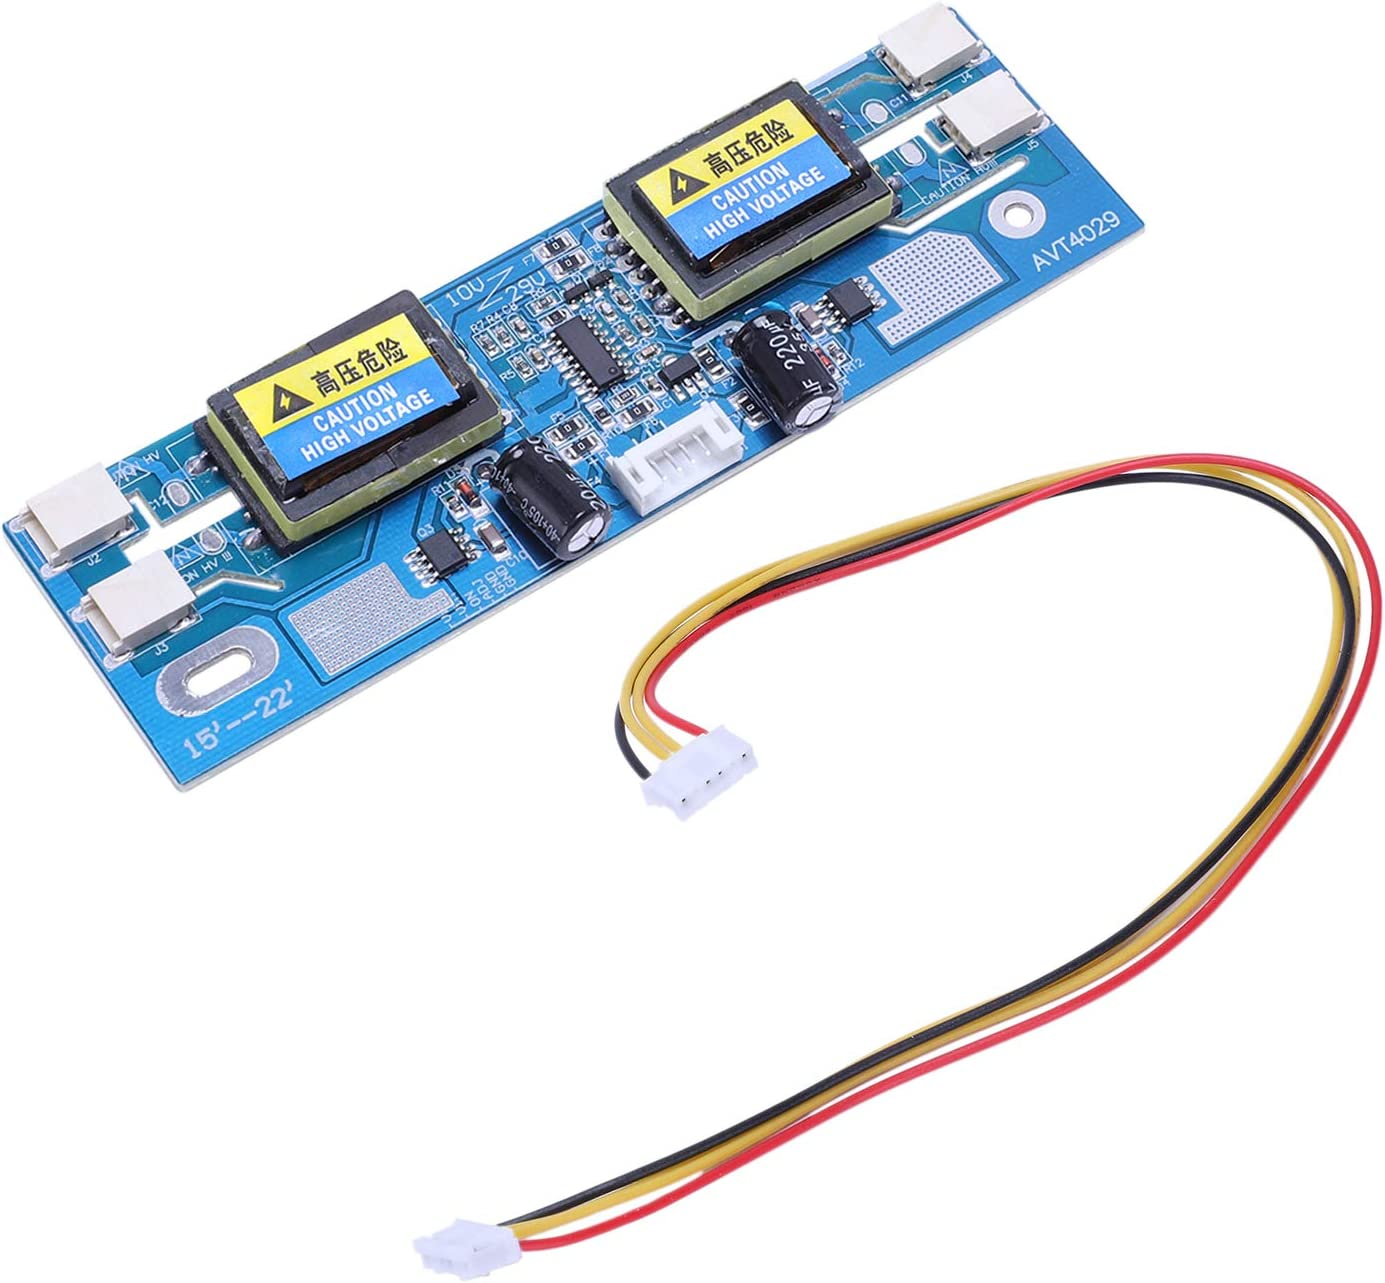 REFURBISHHOUSE Avt4029 Universal Inverter Ersatz Ccfl Inverter LCD Monitor 4 Lampe 10-29V f/ür 15-22 Zoll Breitbild mit 6Pin Kabel